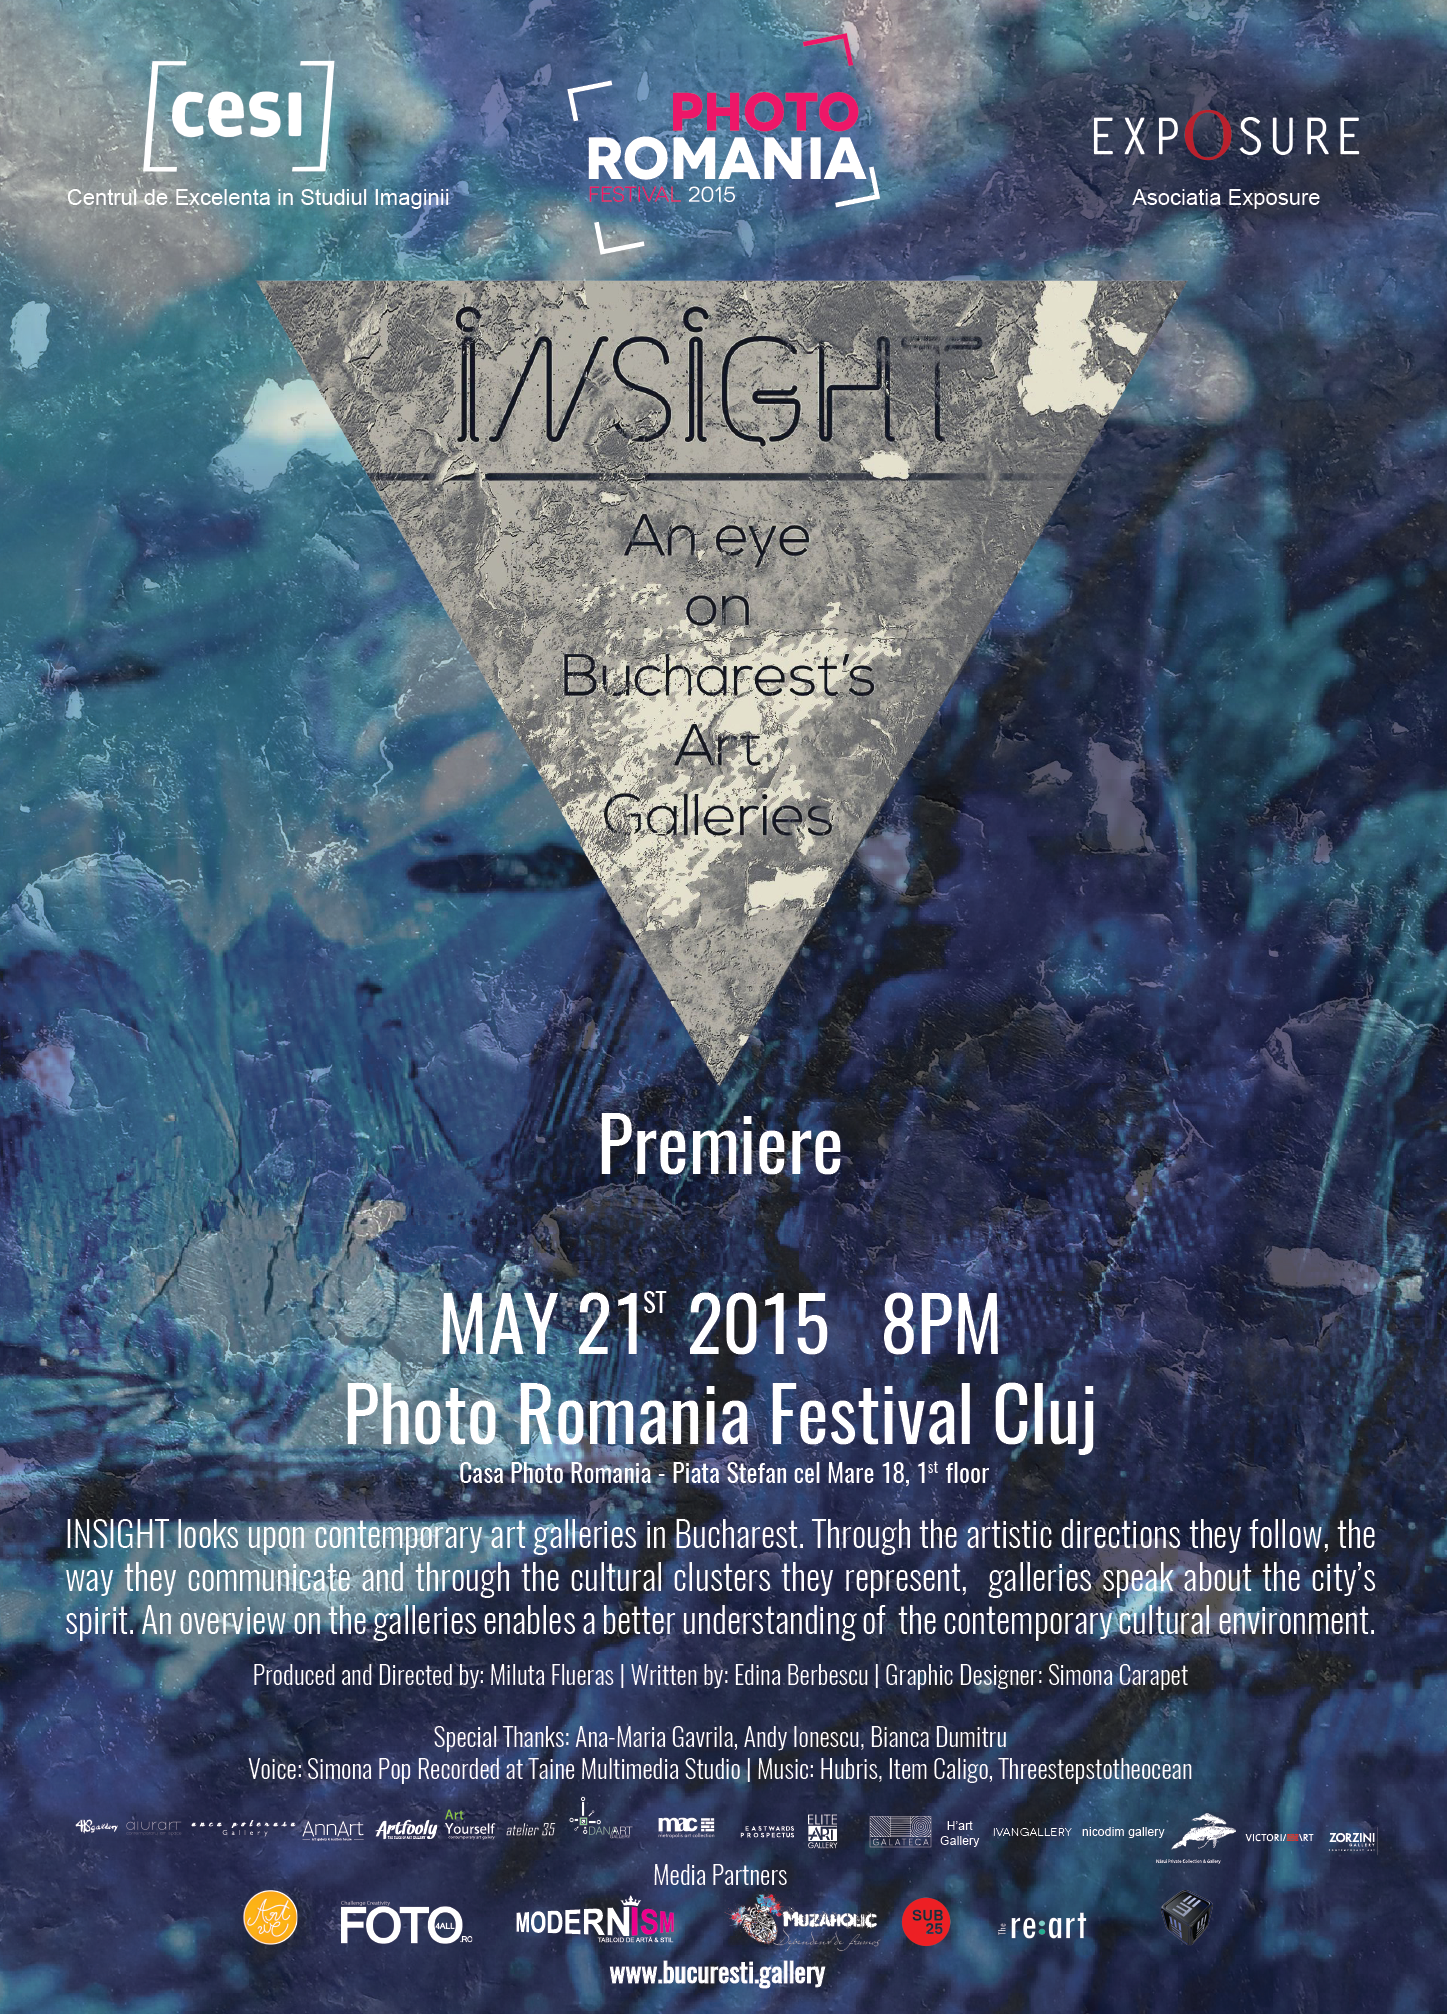 Lansarea documentarului INSIGHT. An eye on Bucharest's art galleries @ Photo Romania Festival